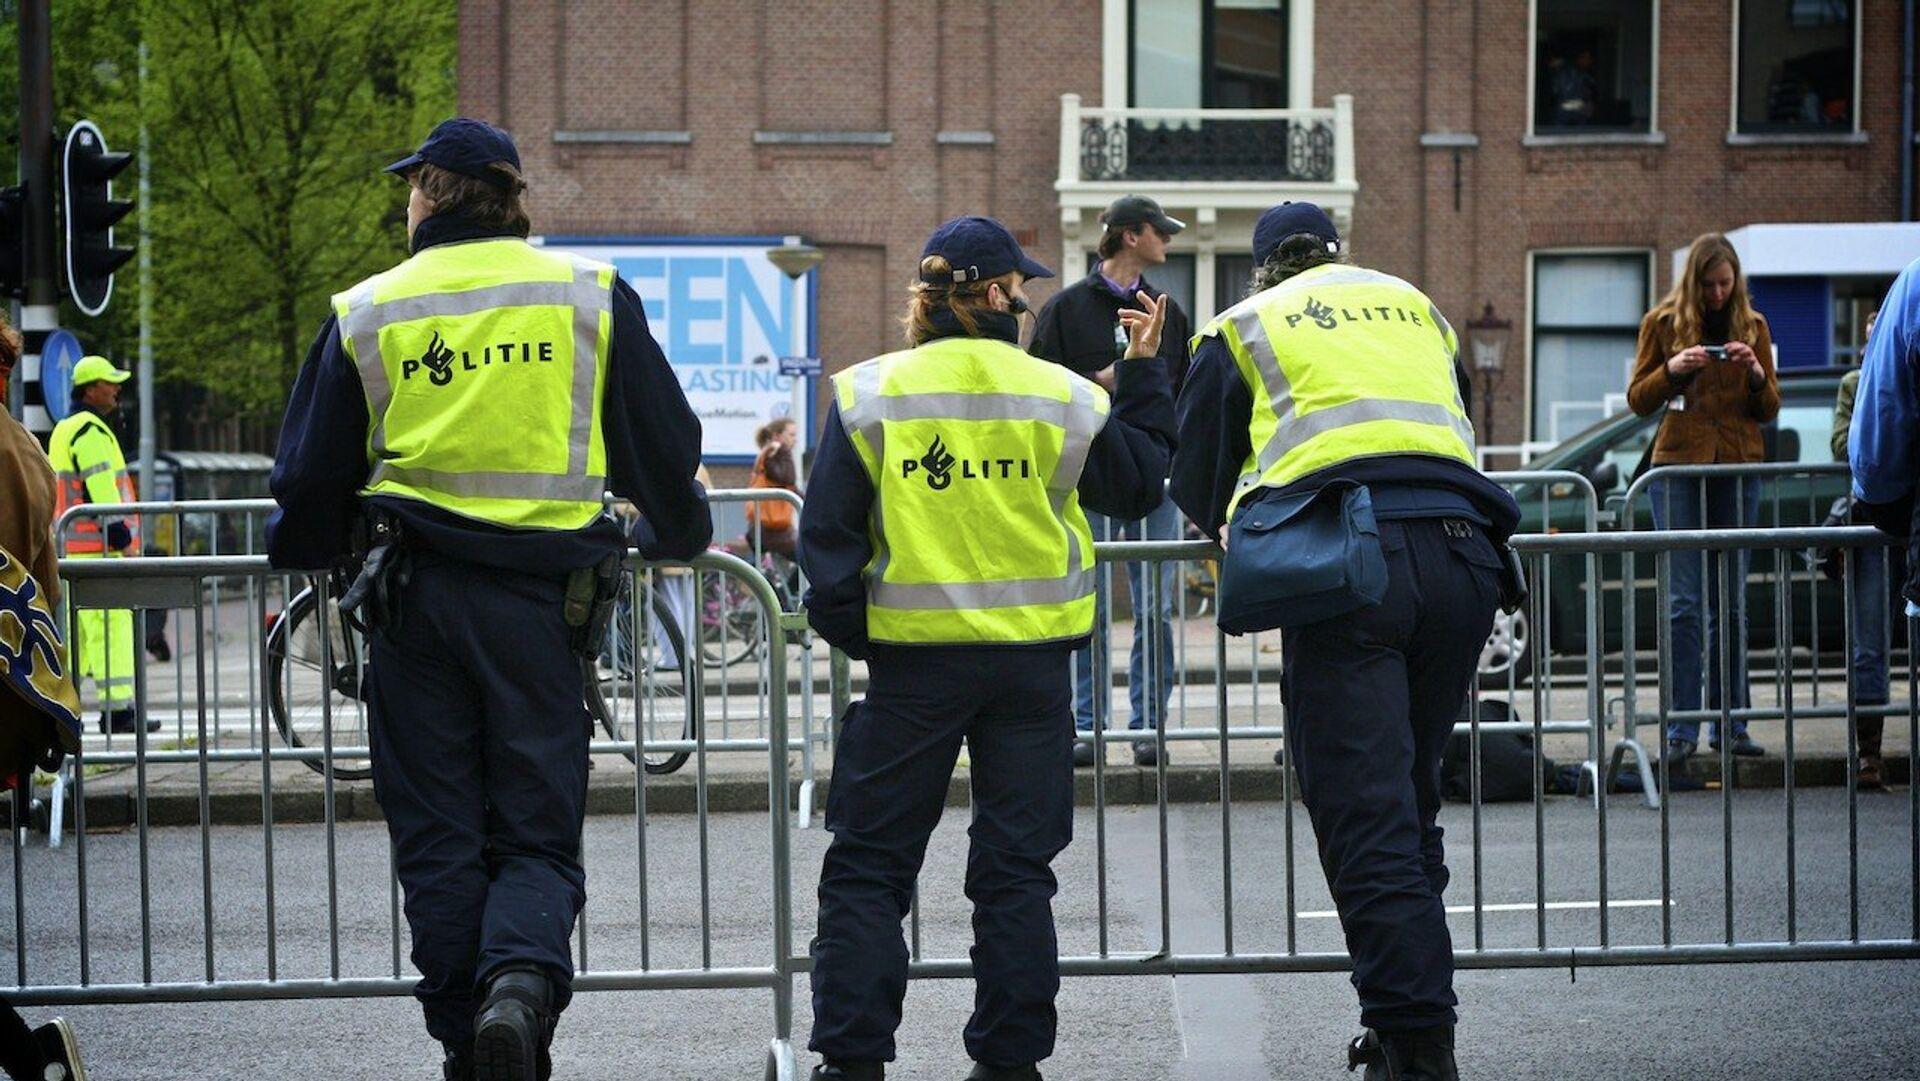 Dutch police - Sputnik International, 1920, 02.08.2021